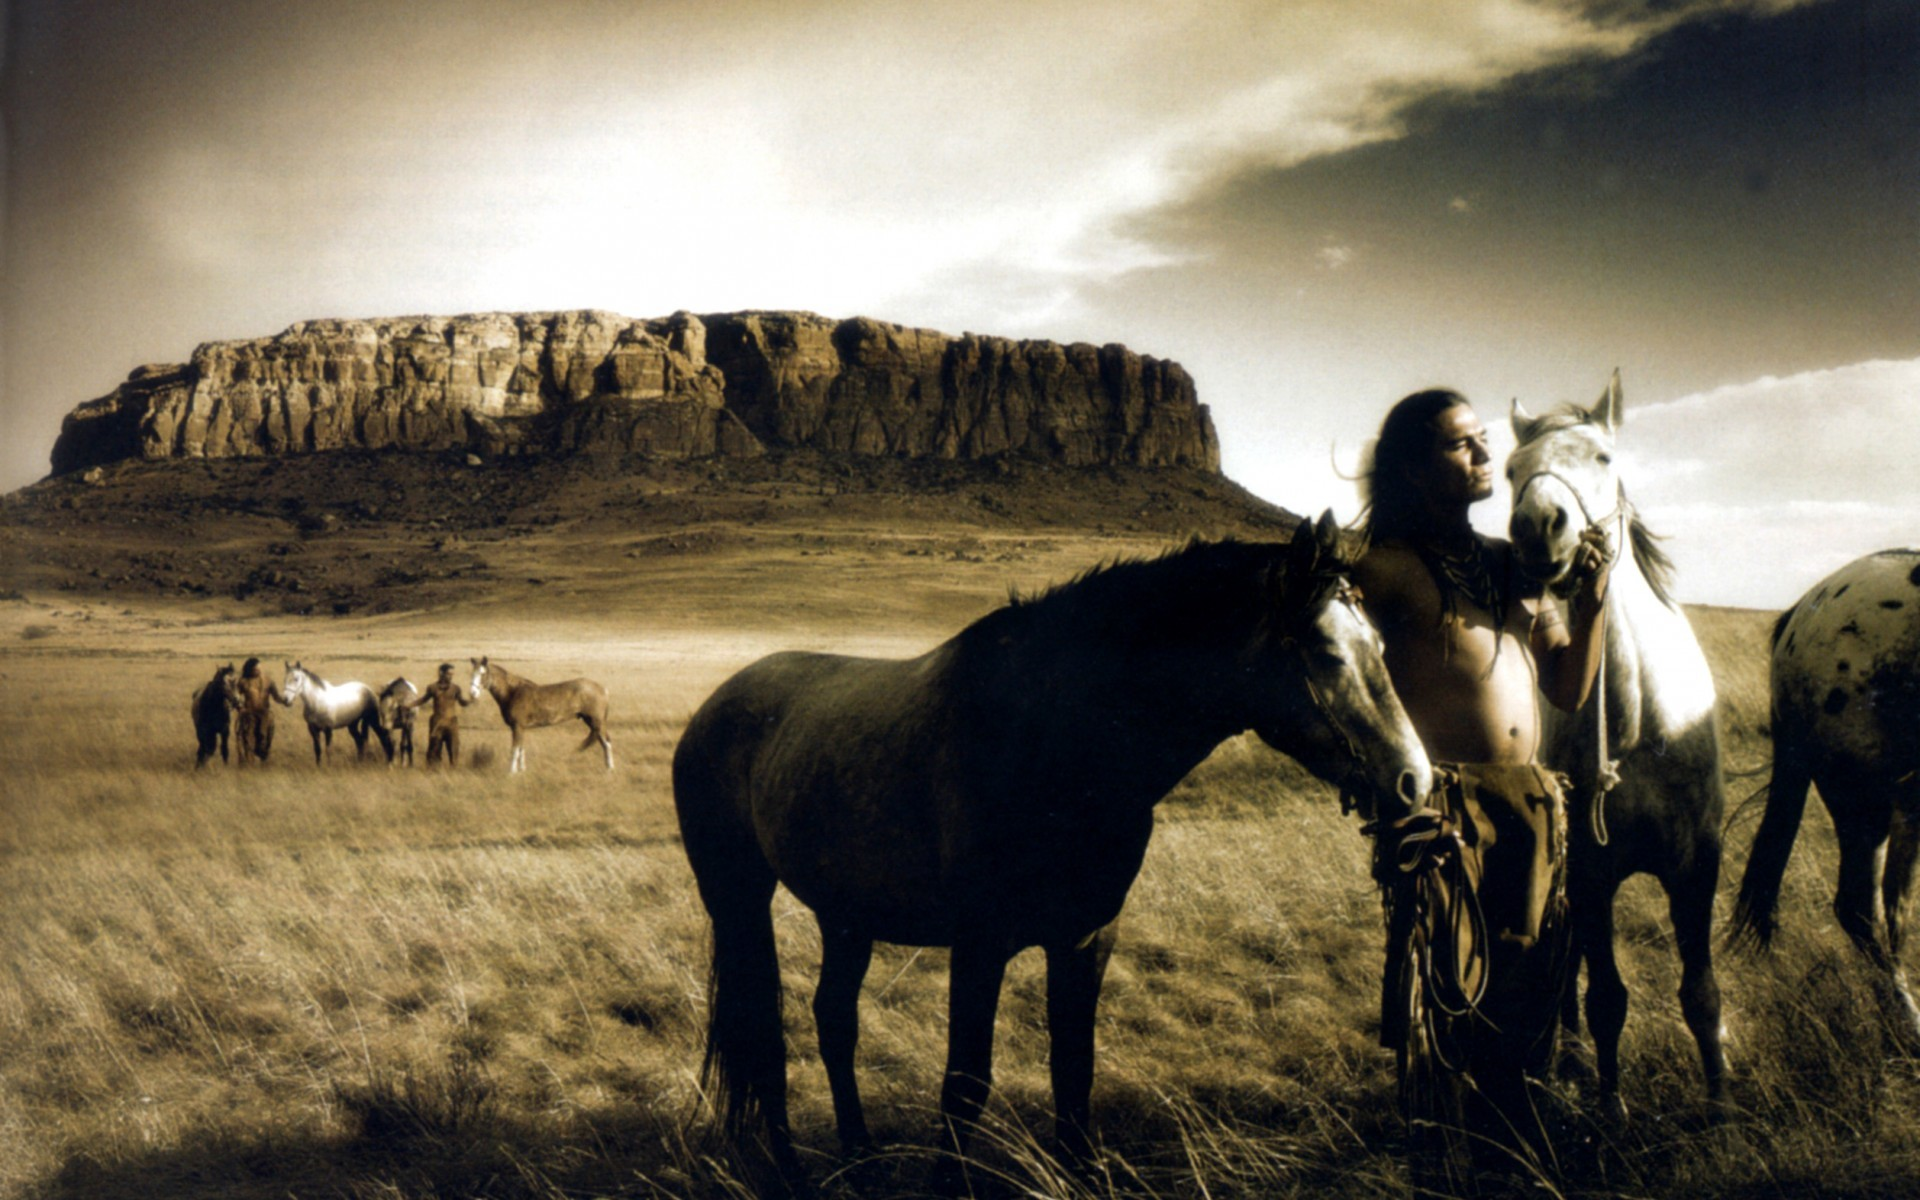 Full HD p Cowboy Wallpapers HD, Desktop Backgrounds Cowboy Pictures Wallpapers  Wallpapers)